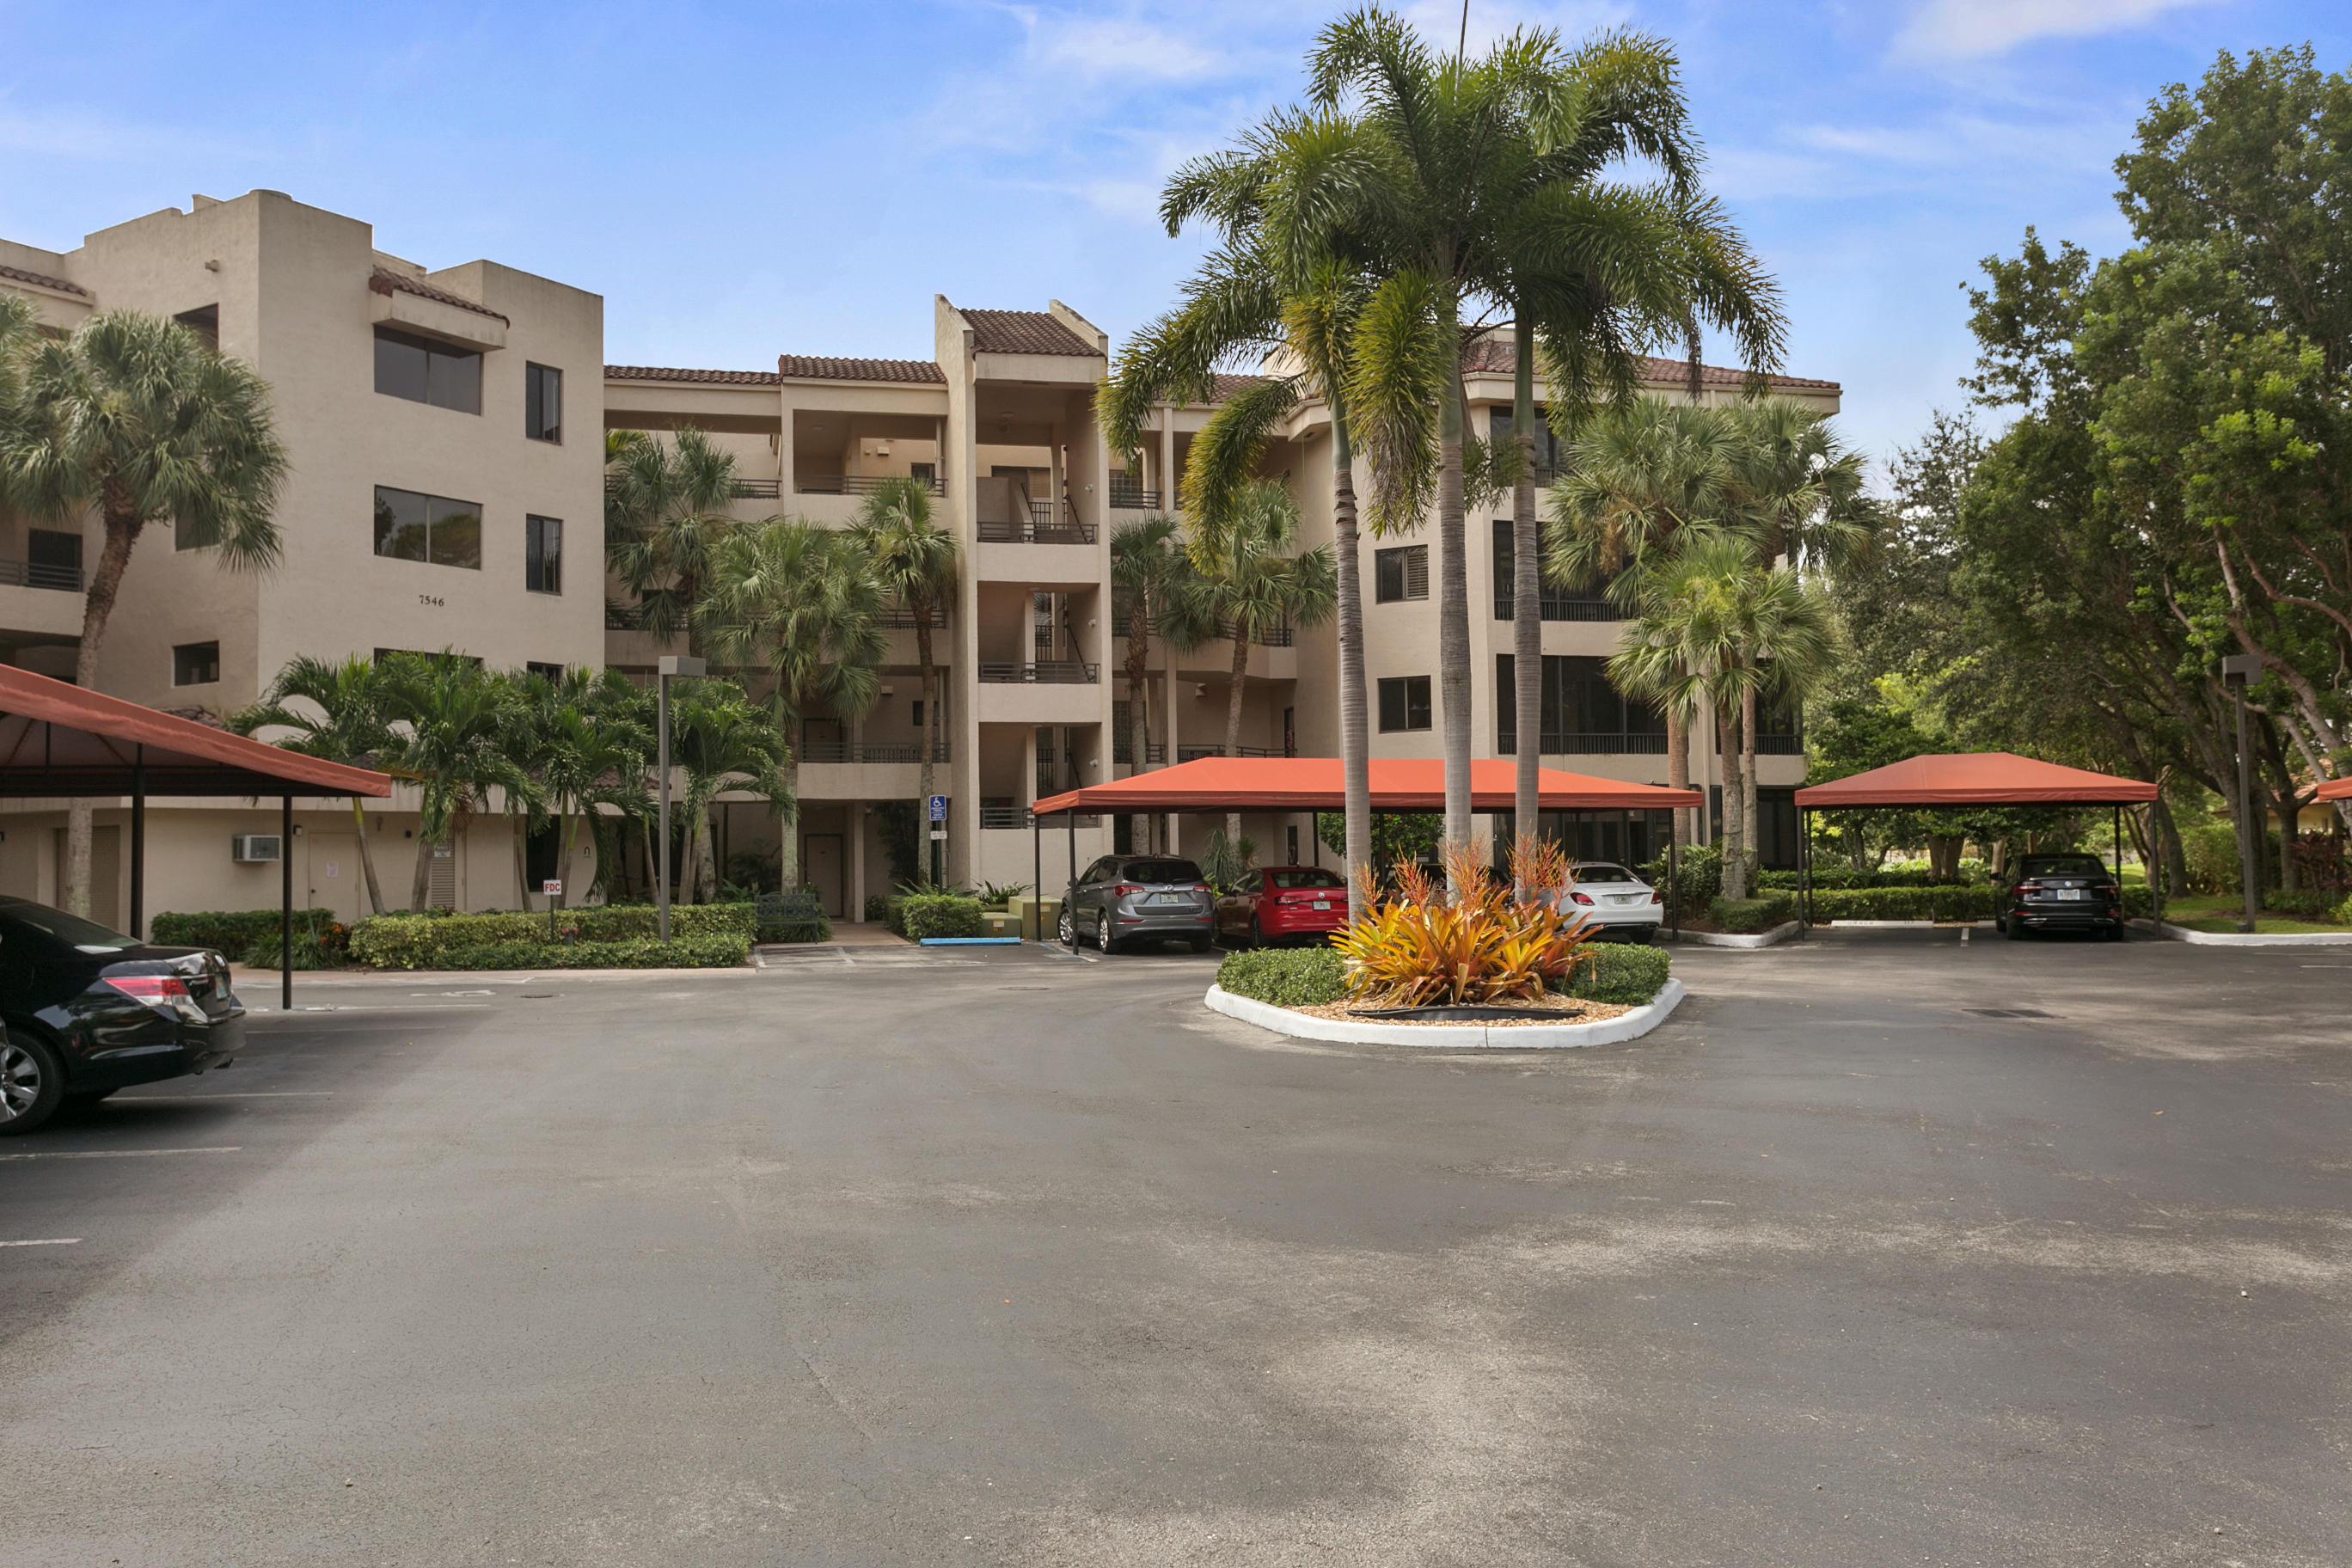 7546 La Paz Boulevard UNIT 408 Boca Raton, FL 33433